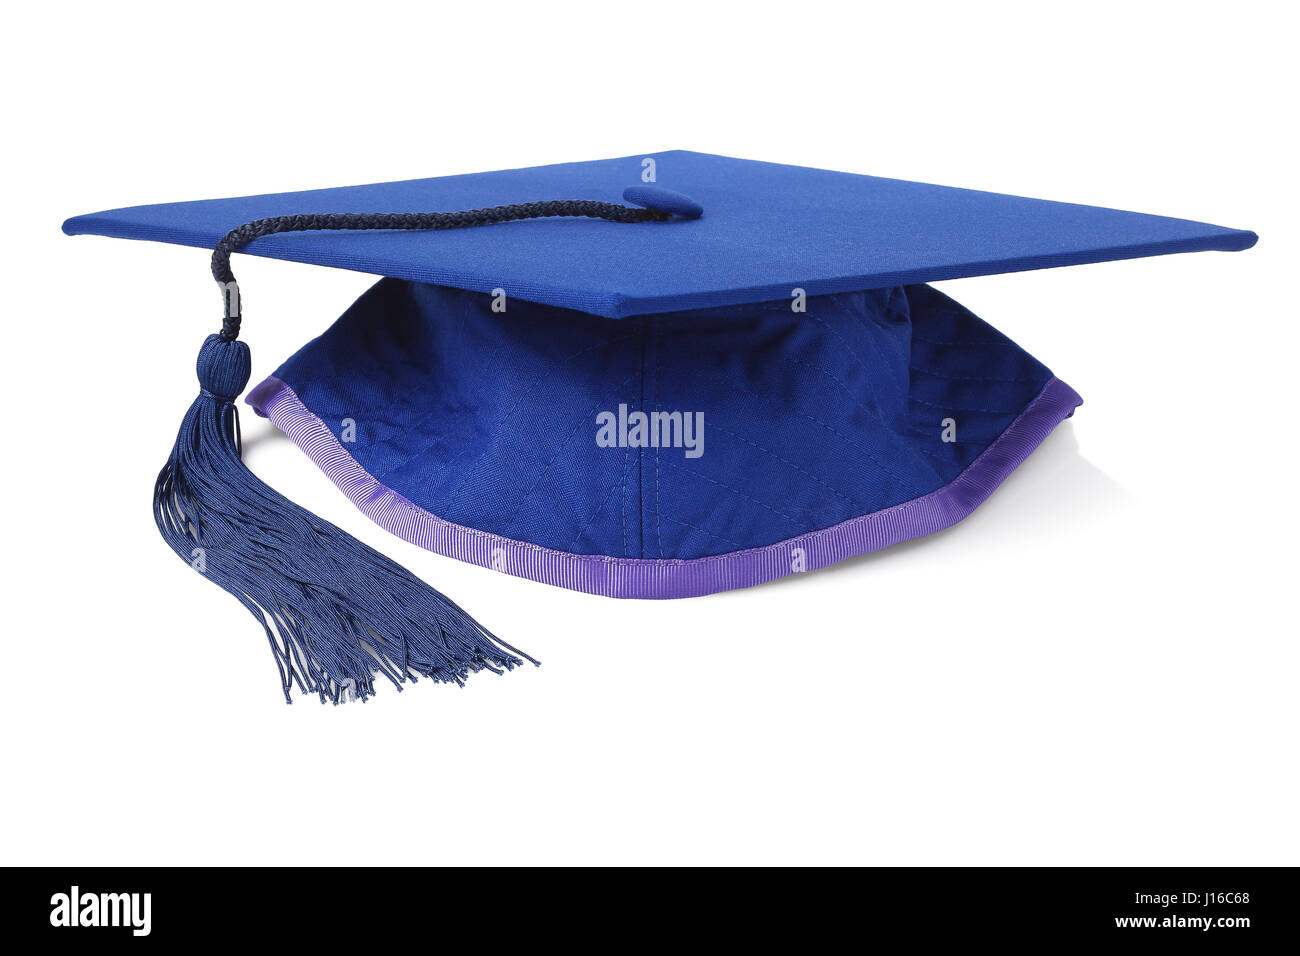 Blue Graduation Mortar Board on White Background - Stock Image